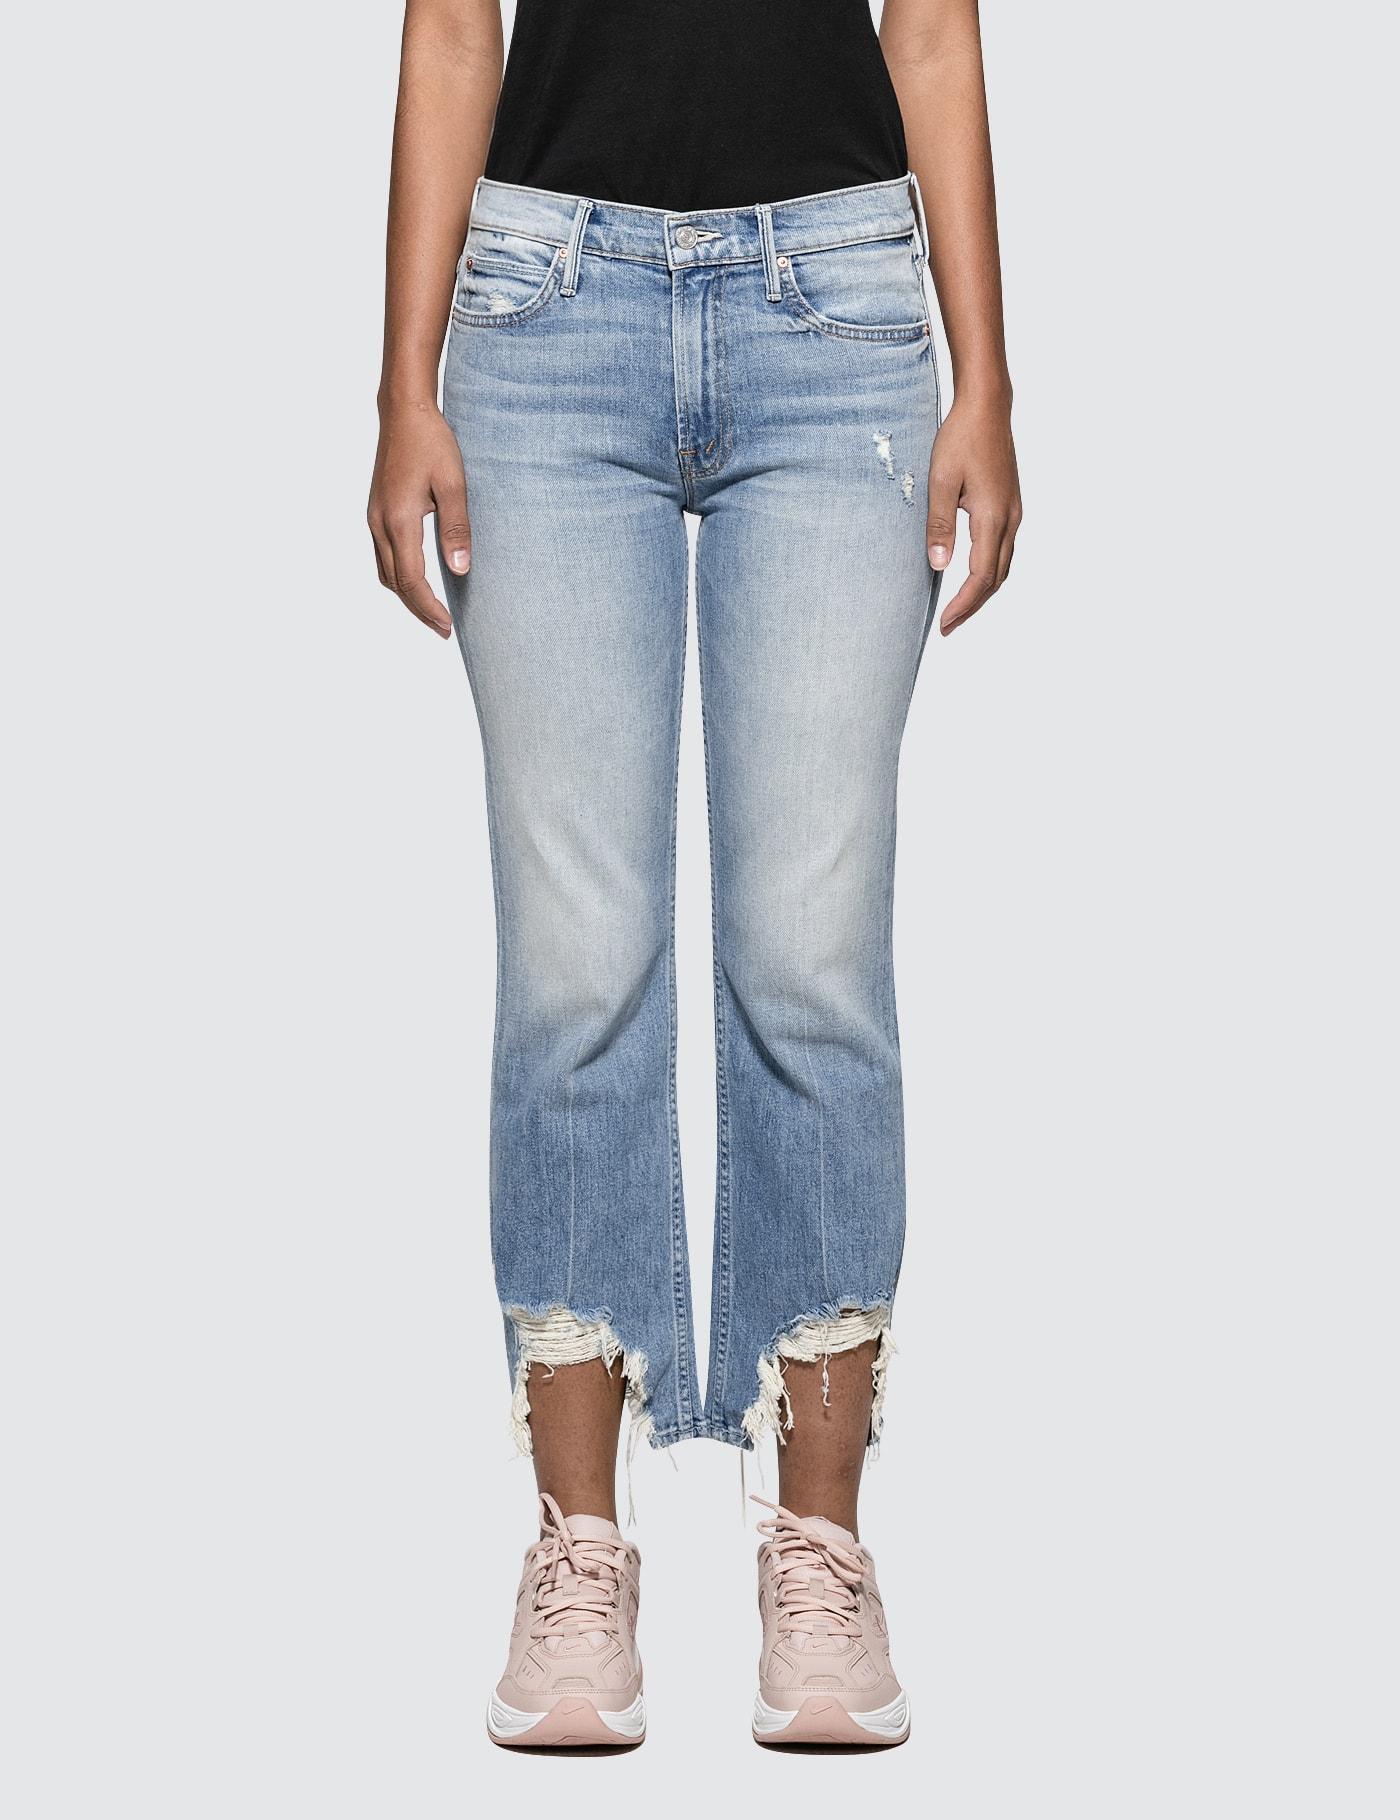 Dutchie Ankle Jaws Jeans